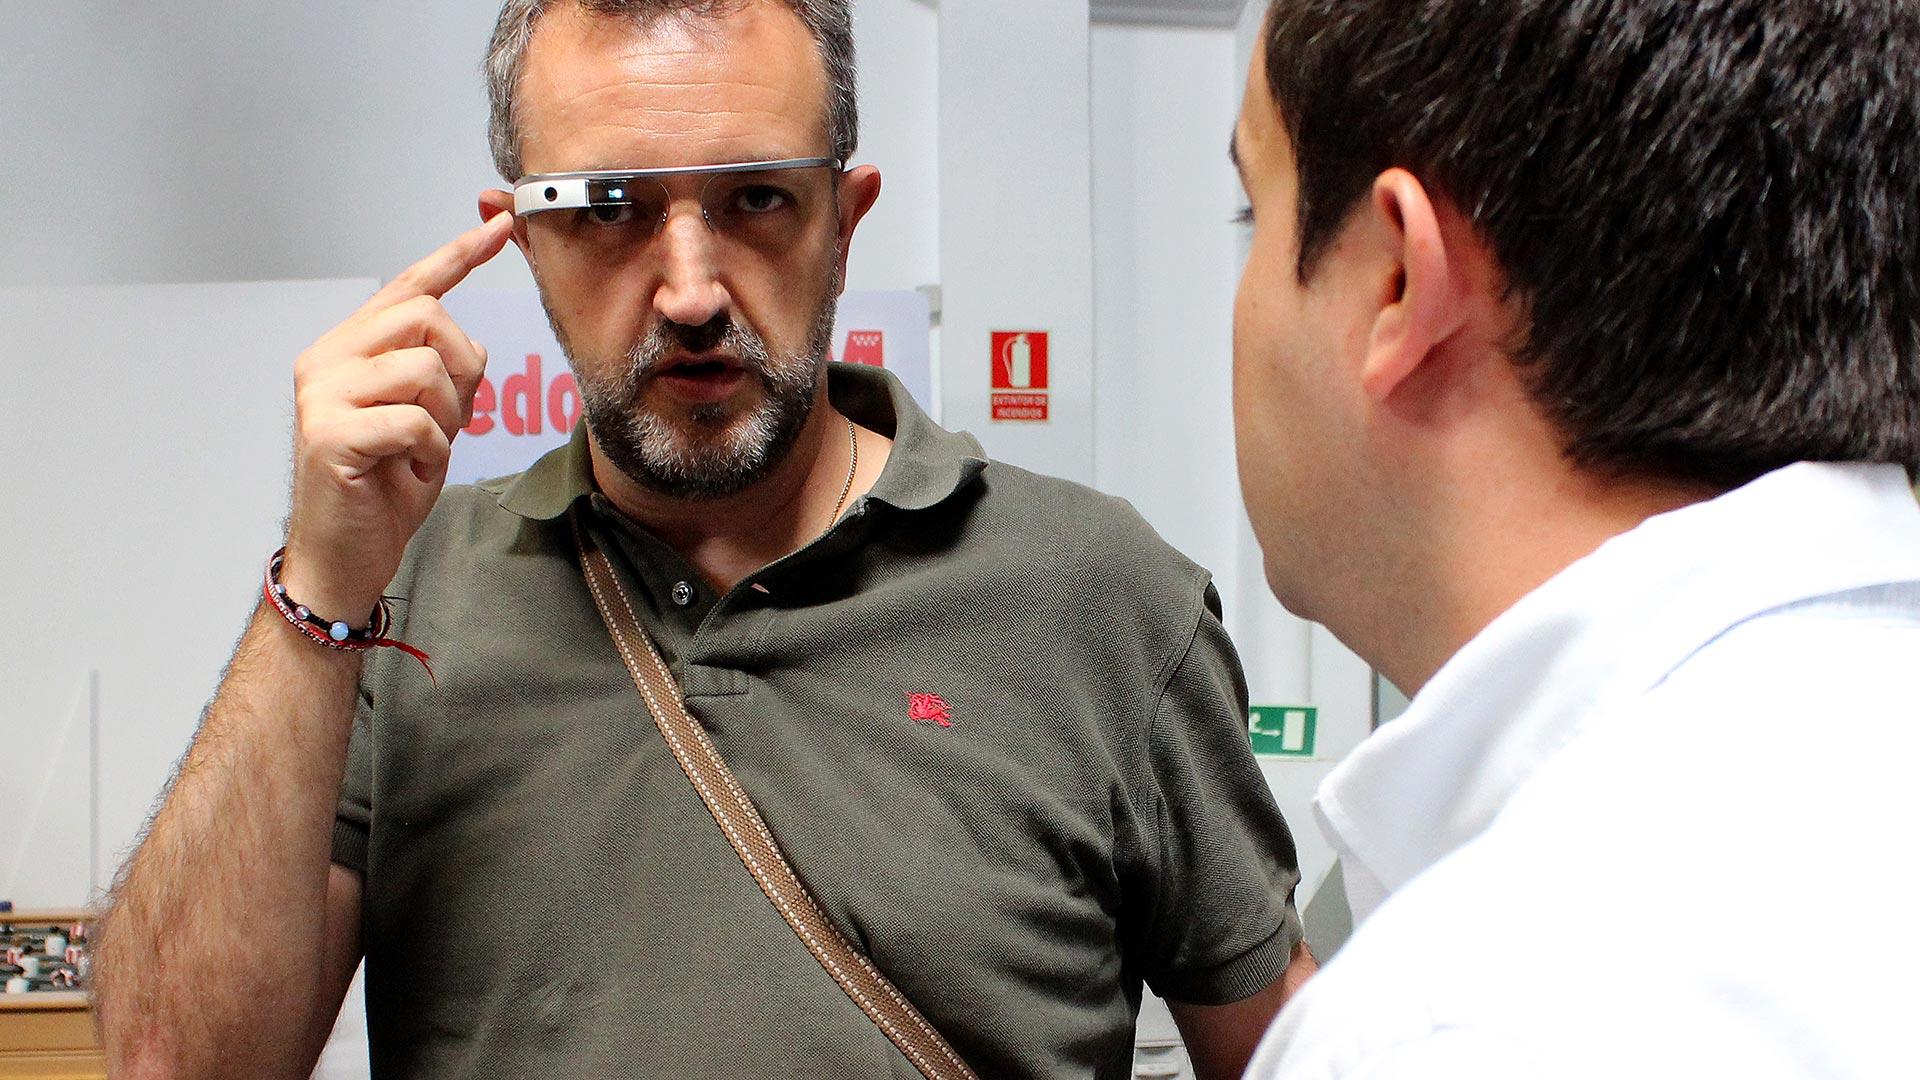 tpnet-eventos-encuentros-profesionales-iot-google-glasses-tester